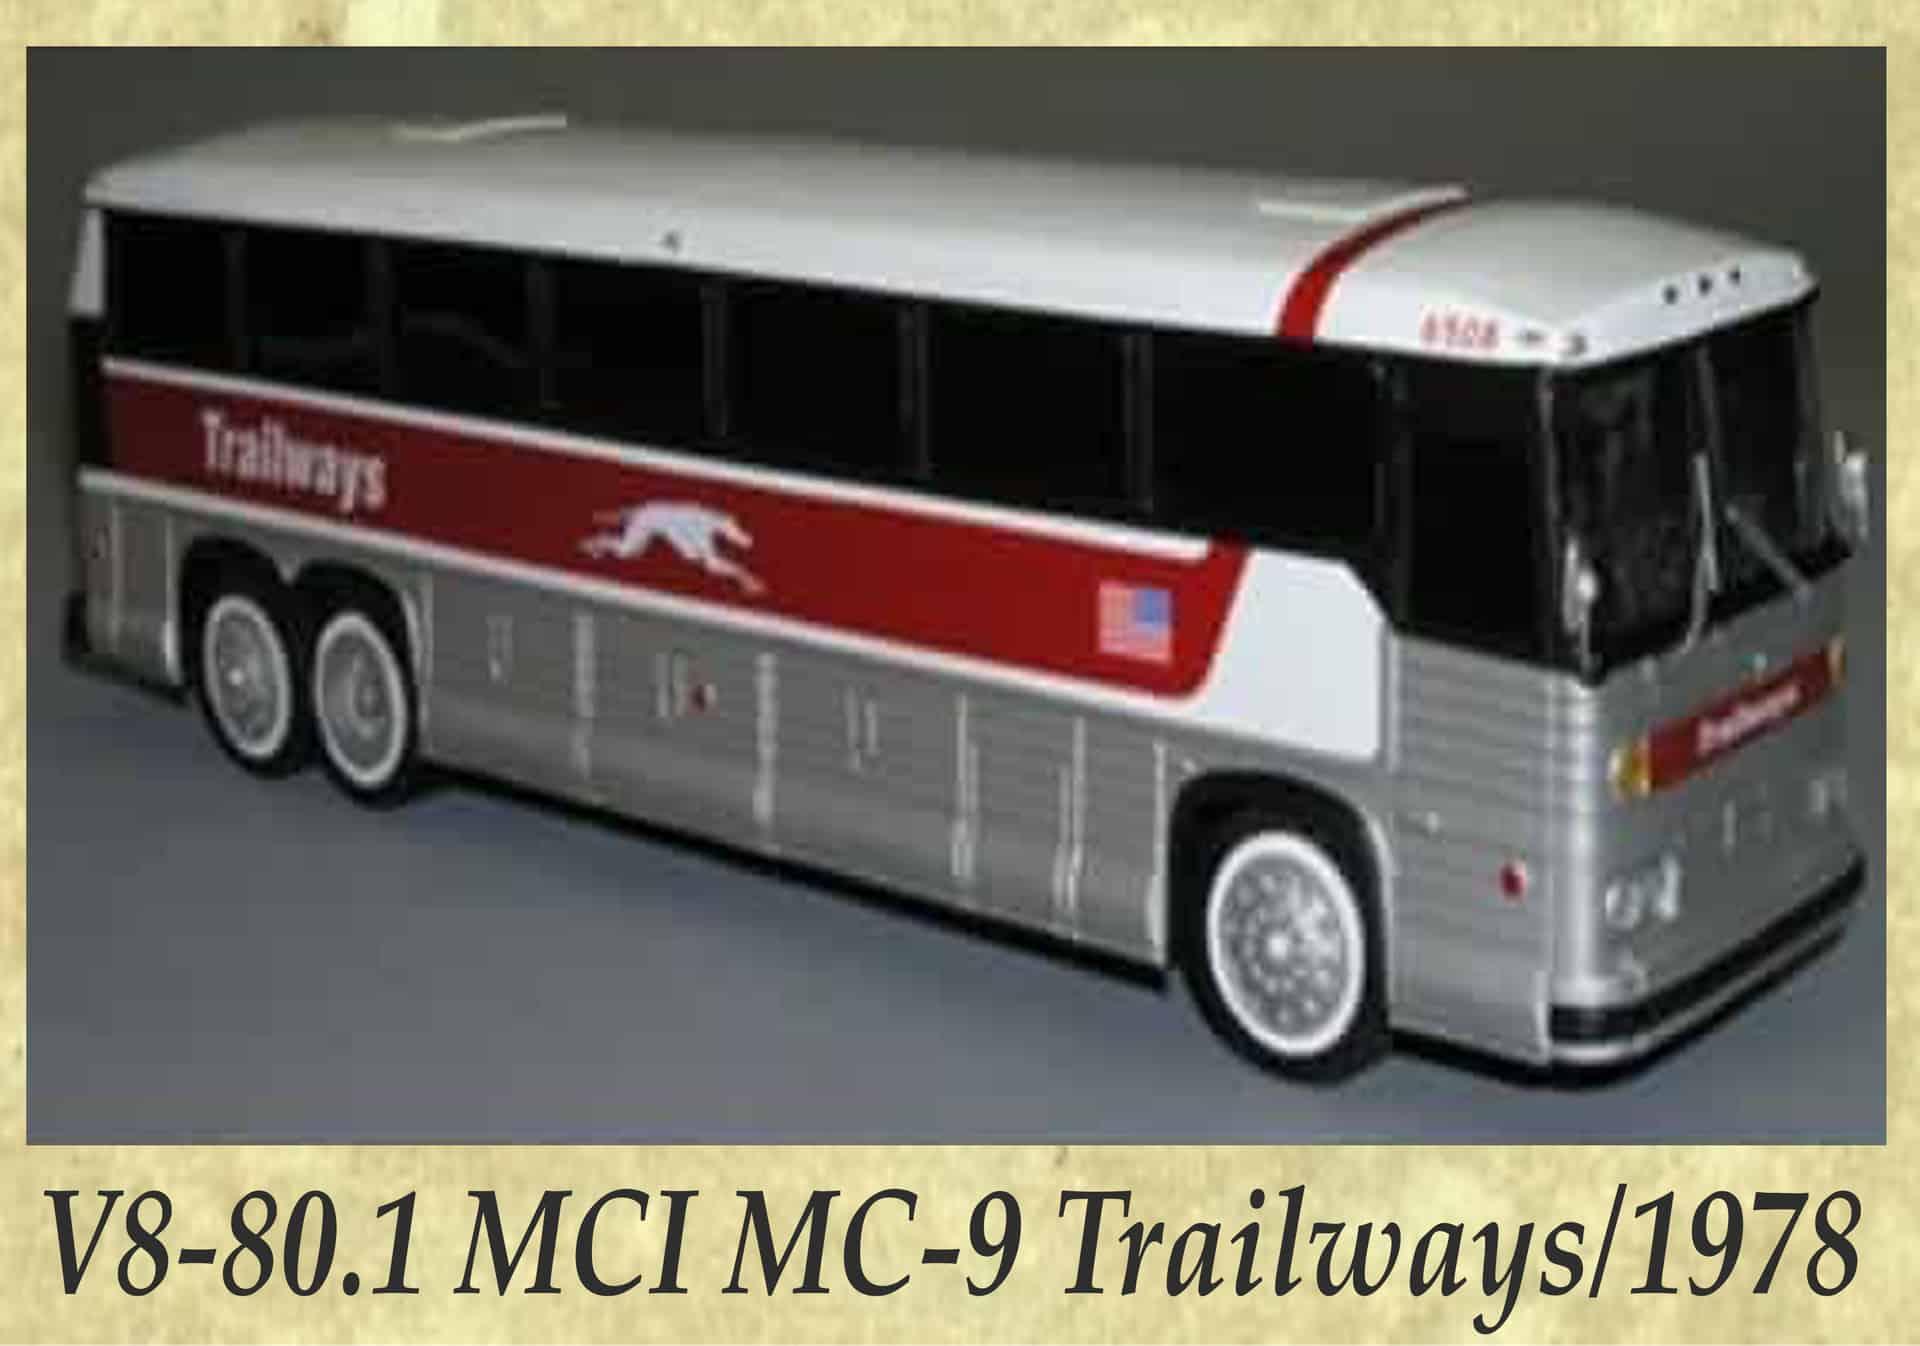 V8-80.1 MCI MC-9 Trailways 1978